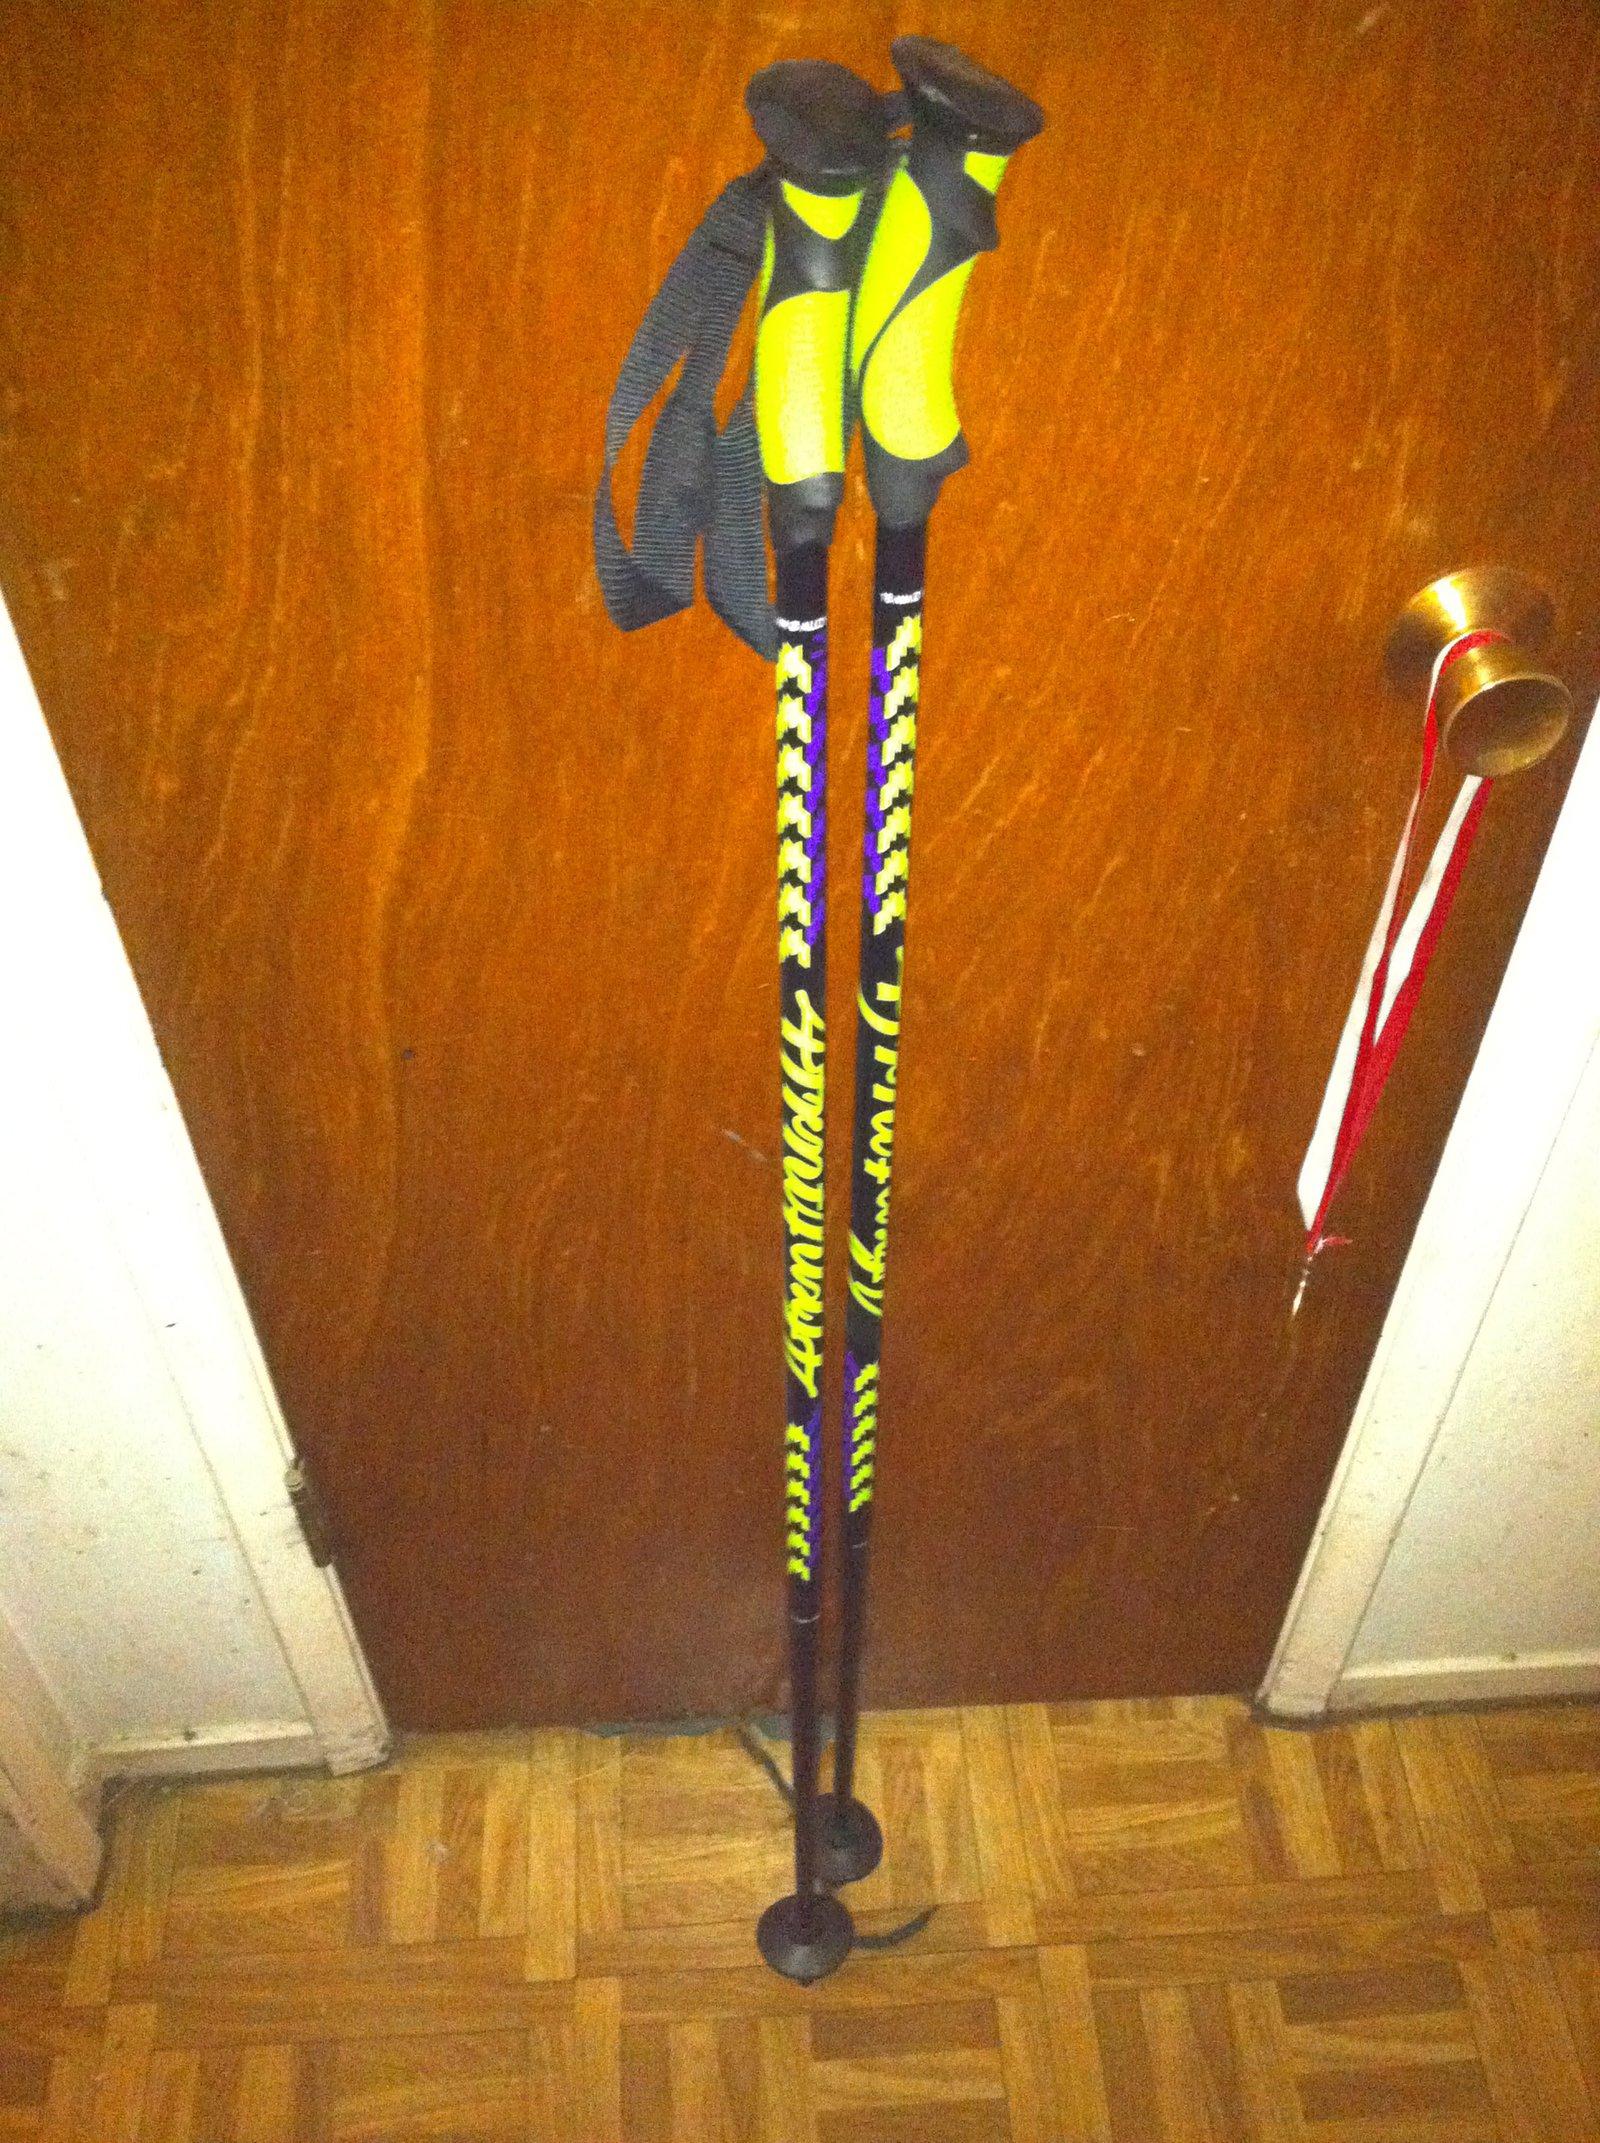 FS 4frnt poles